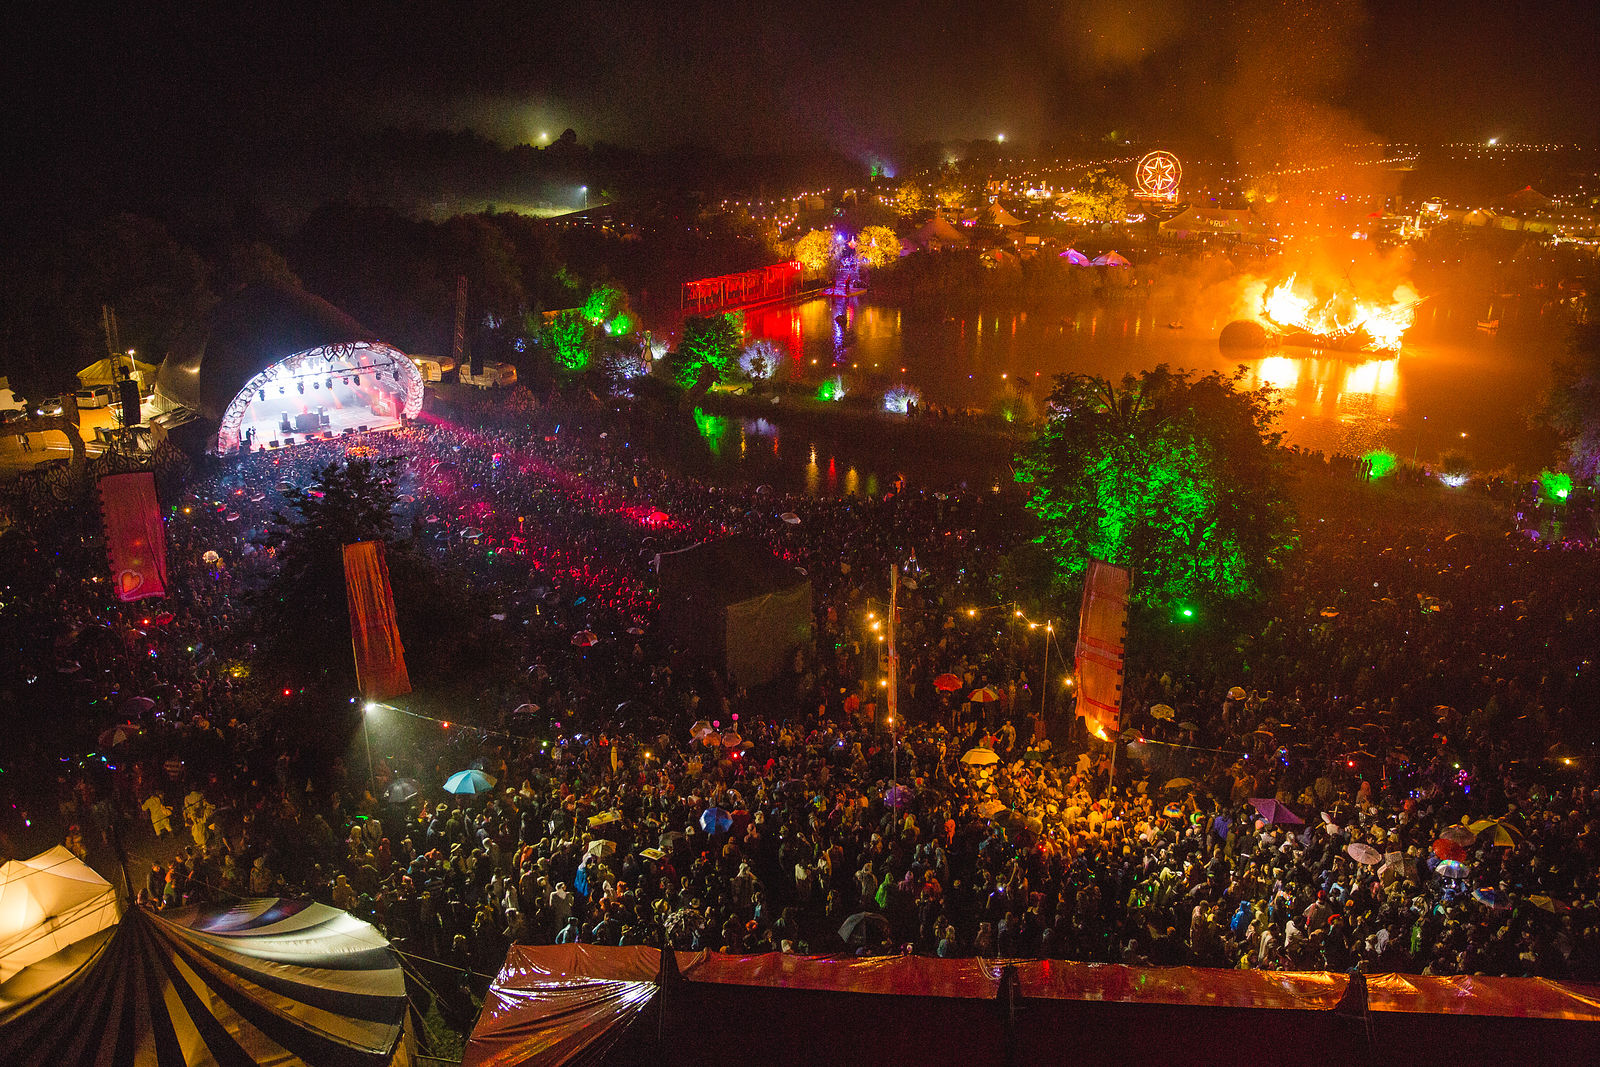 Secret Garden Party | 2013 | The Big Burn | The Big Burn